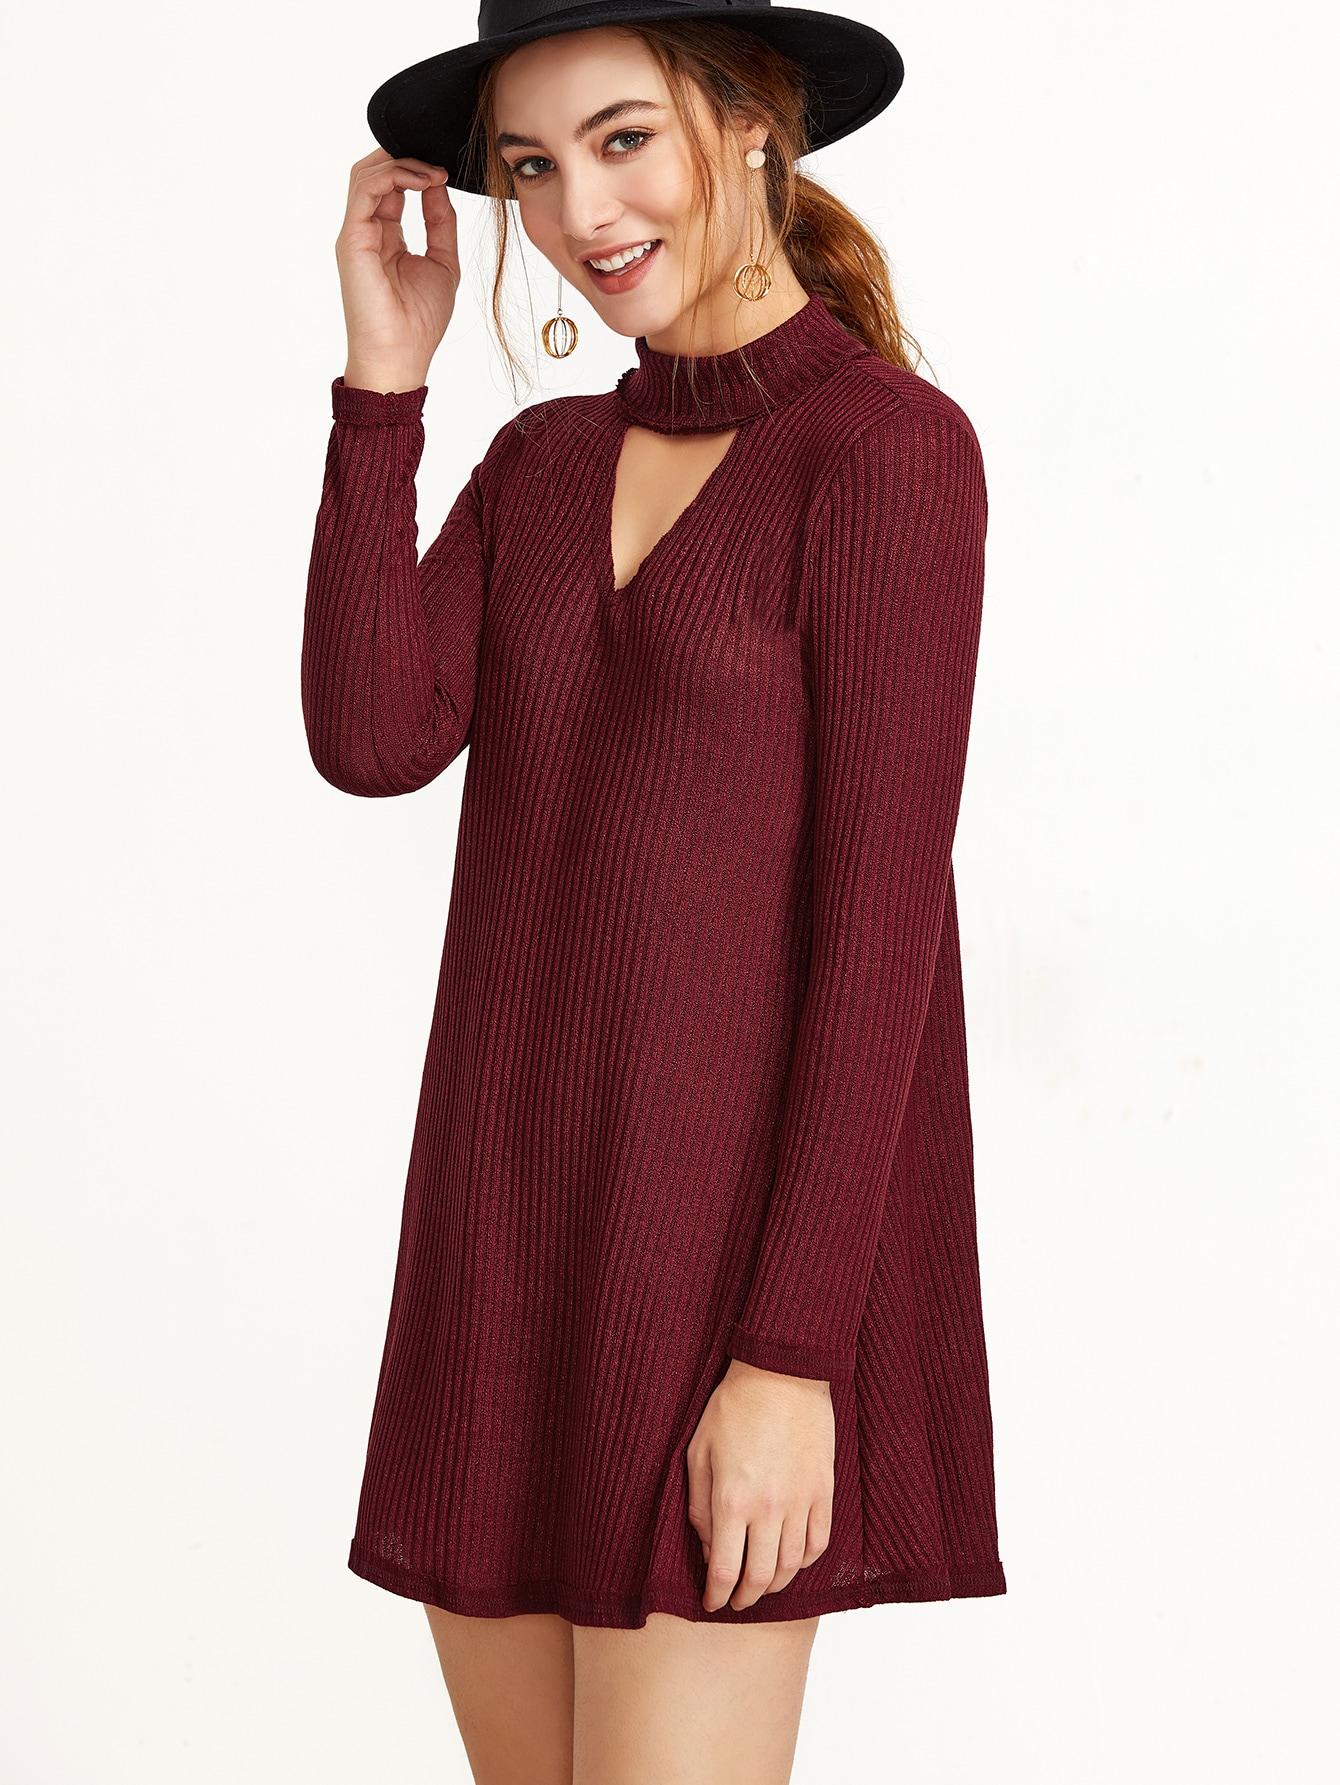 Burgundy Mock Neck Cut Out Ribbed Dress dress161111301